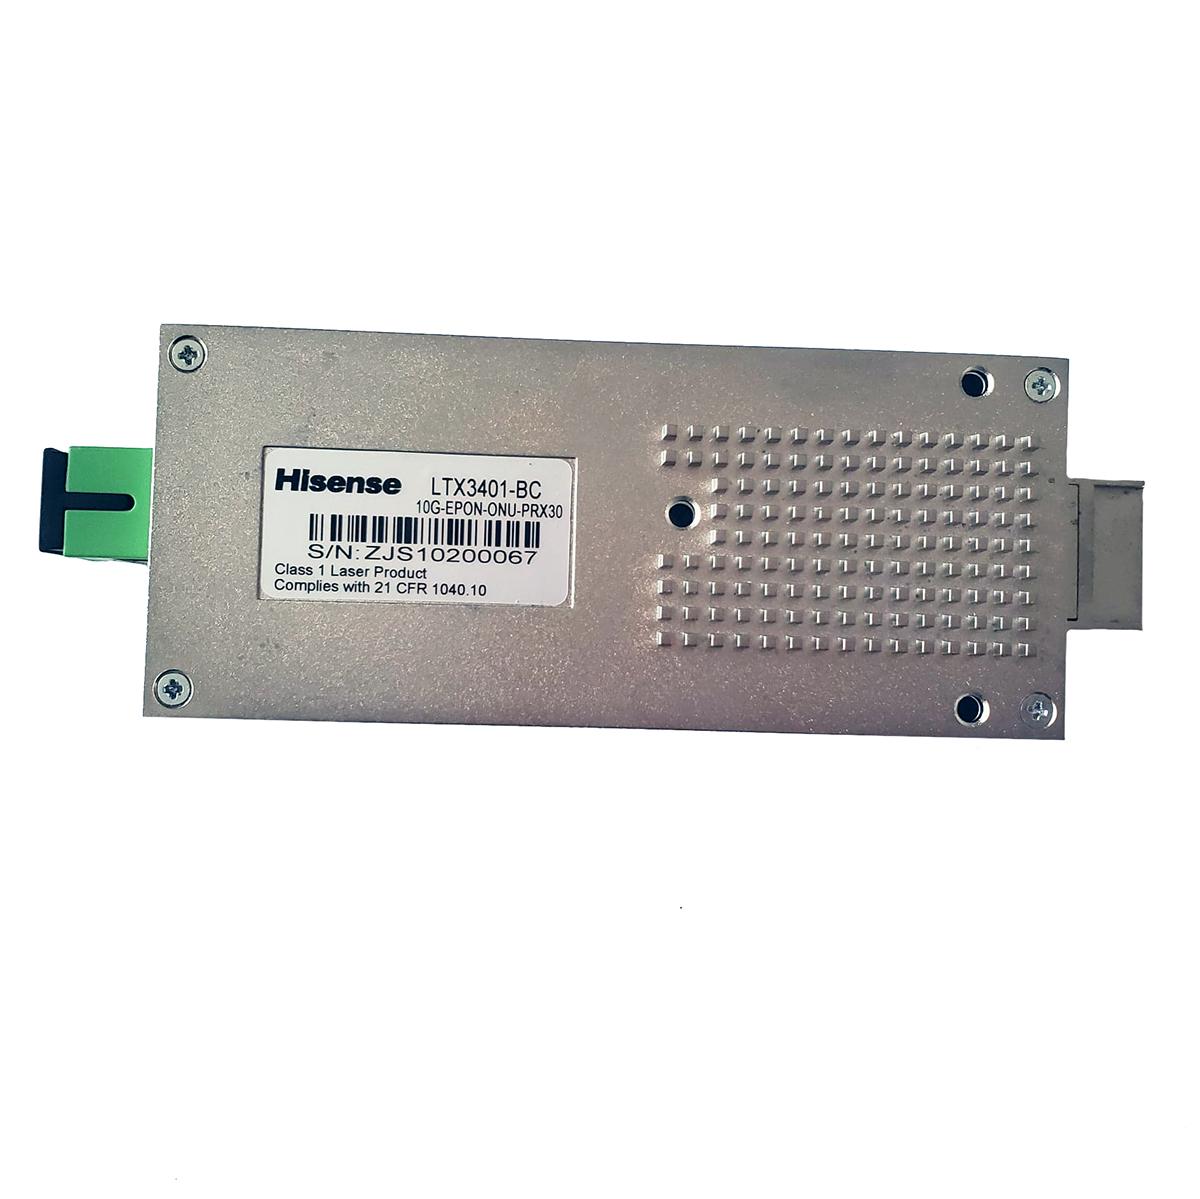 LTX3401-BC Optical Transceiver Hisense